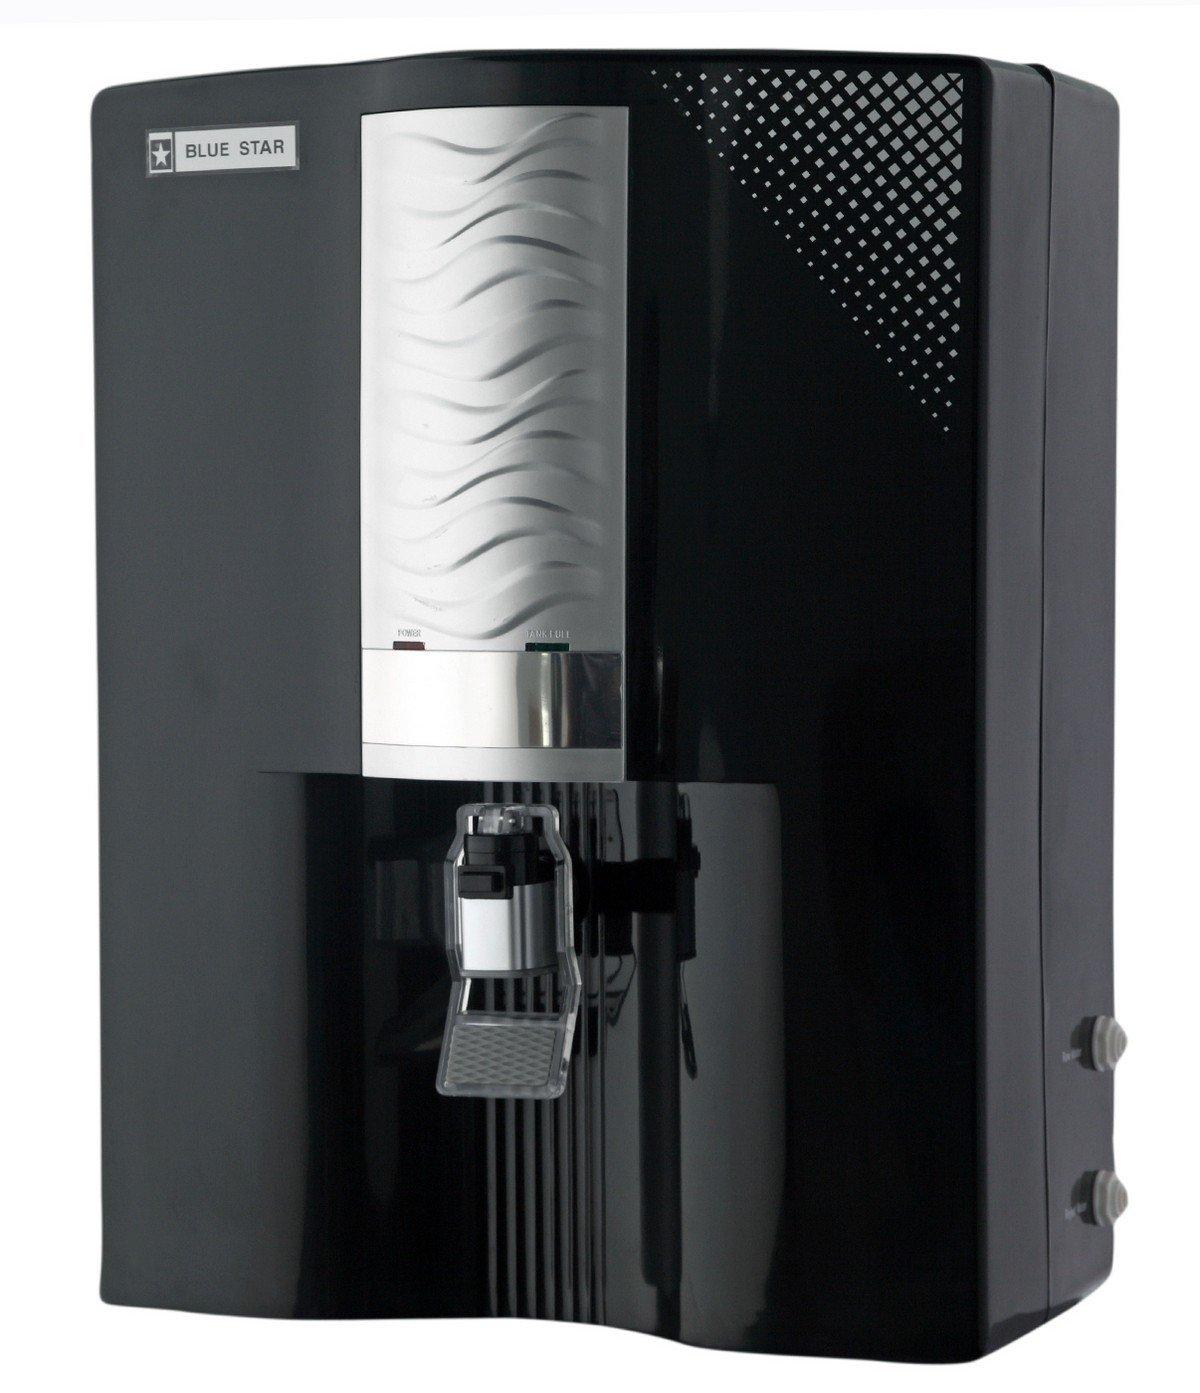 Blue Star Majesto Ma4bsam02 8 Litre Ro Uv Water Purifier Amazon Locklock Food Container Classics 34l Hpl848 Home Kitchen